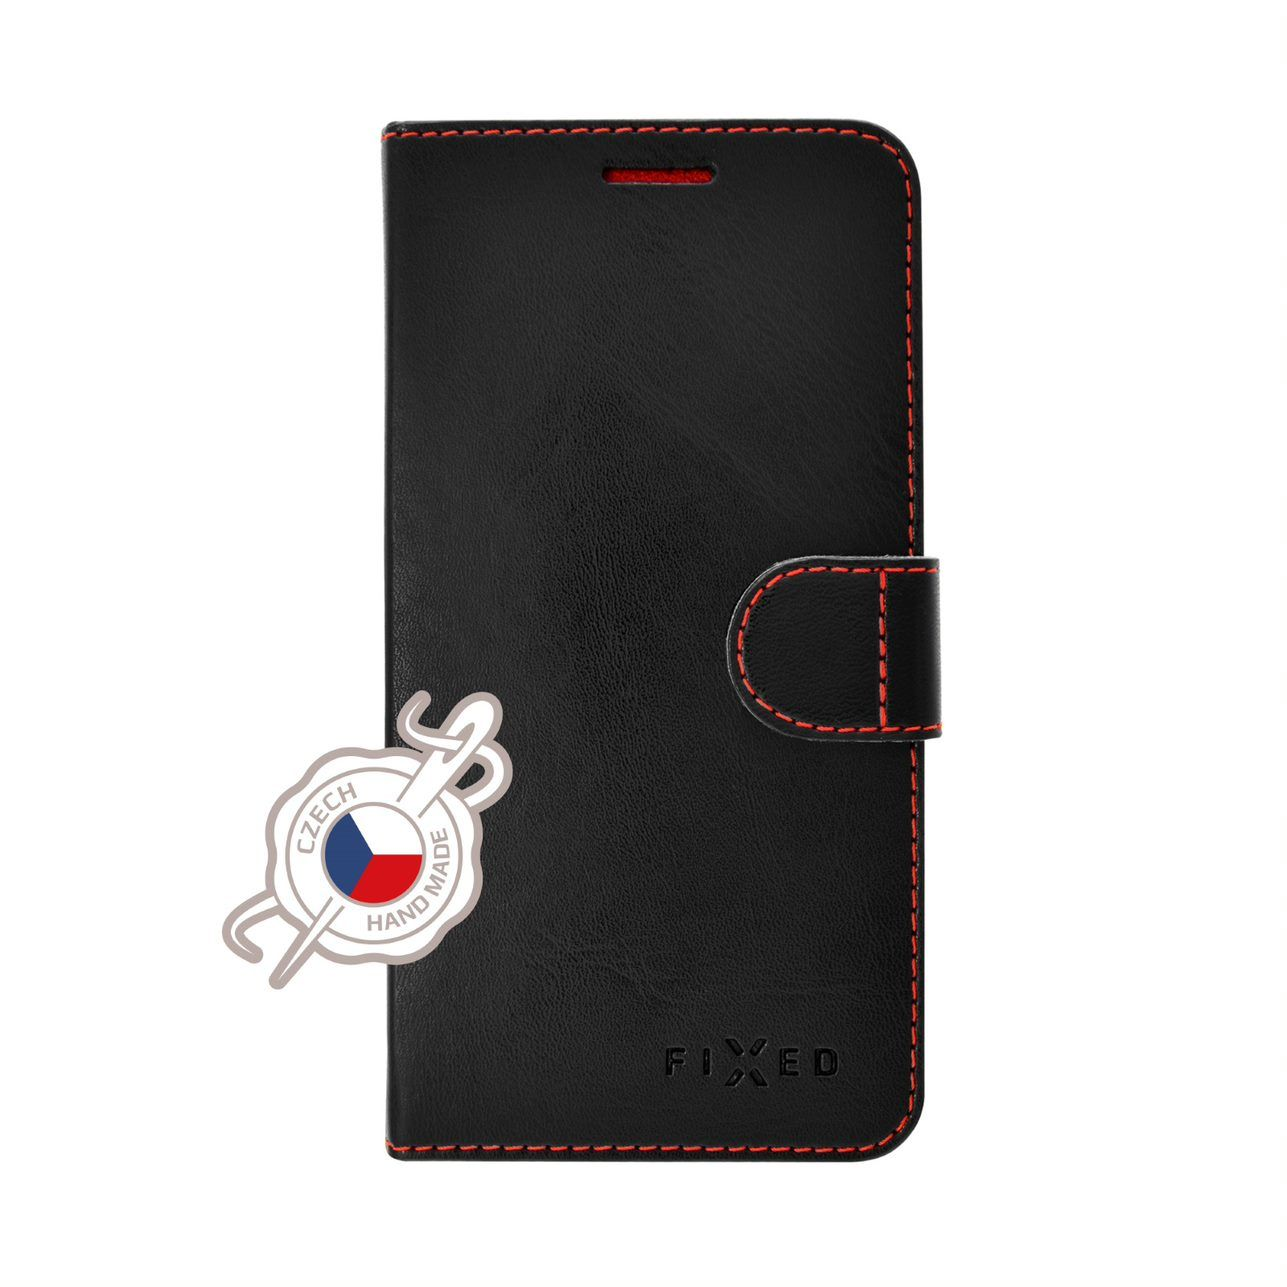 Pouzdro typu kniha FIXED FIT pro Samsung Galaxy A70/A70s, černé